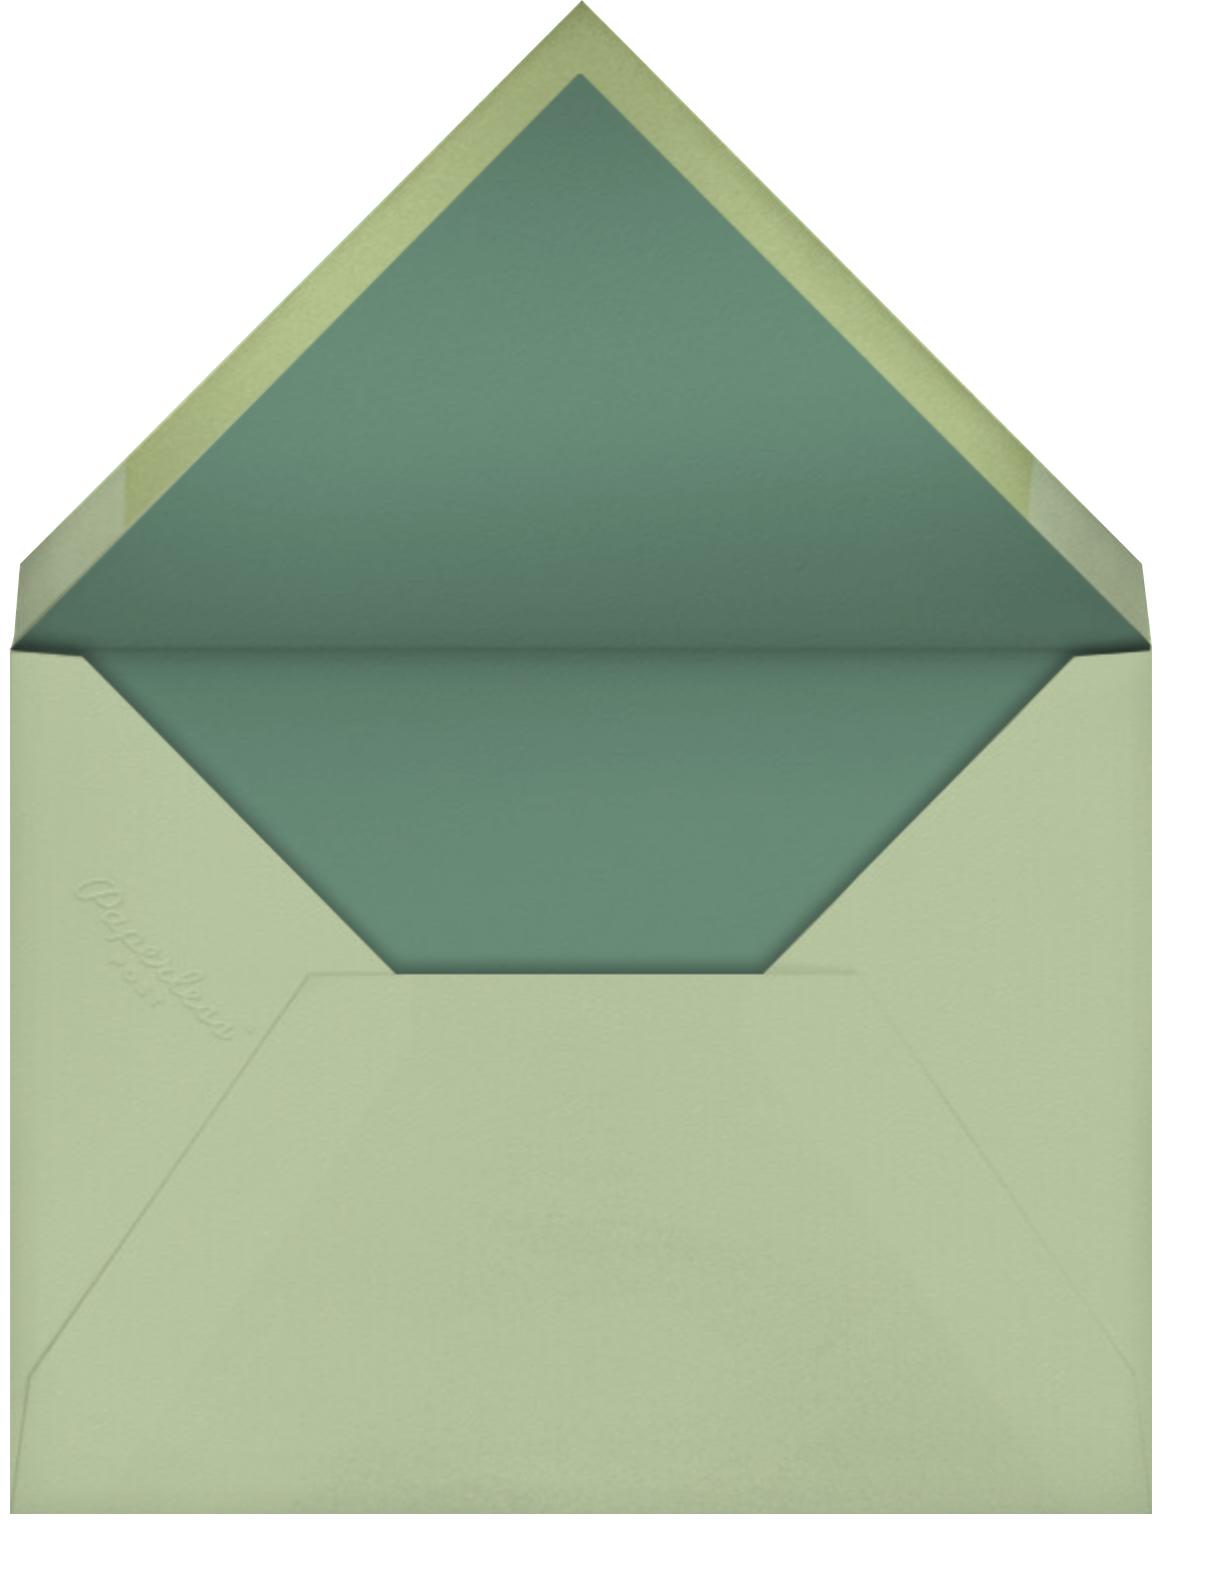 Home Advantage - Paperless Post - Envelope